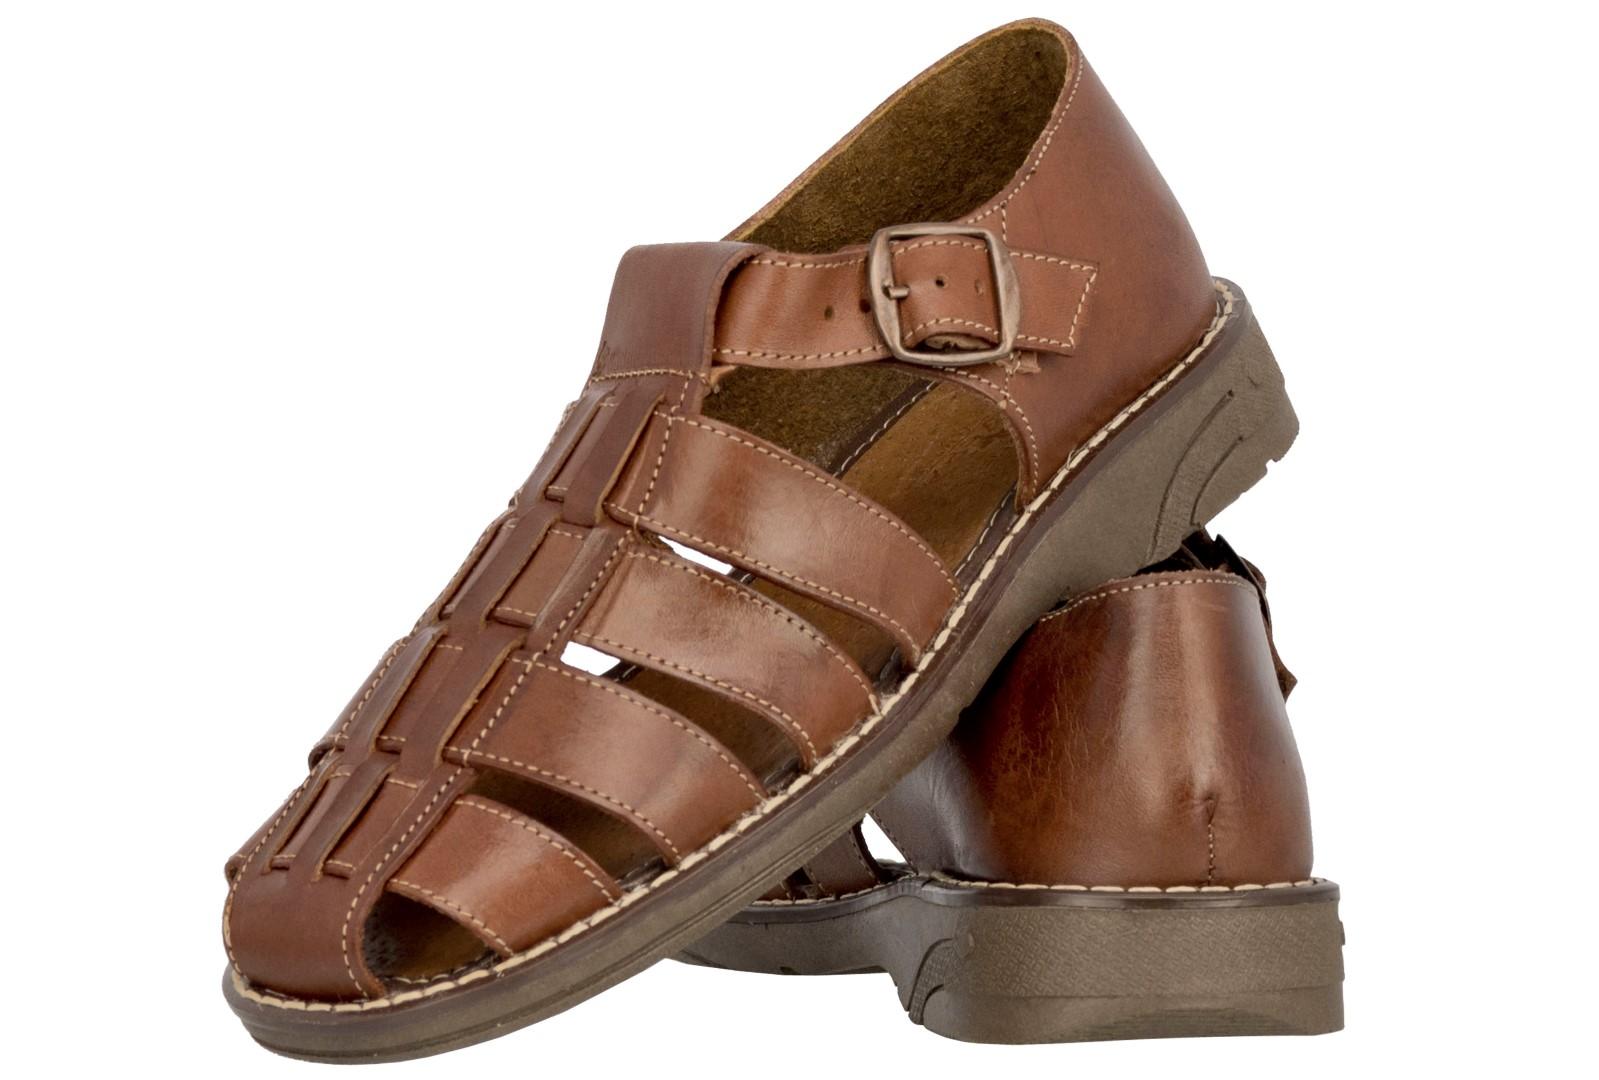 6da49fb8b7a97 Buy original huarache sandals - 52% OFF